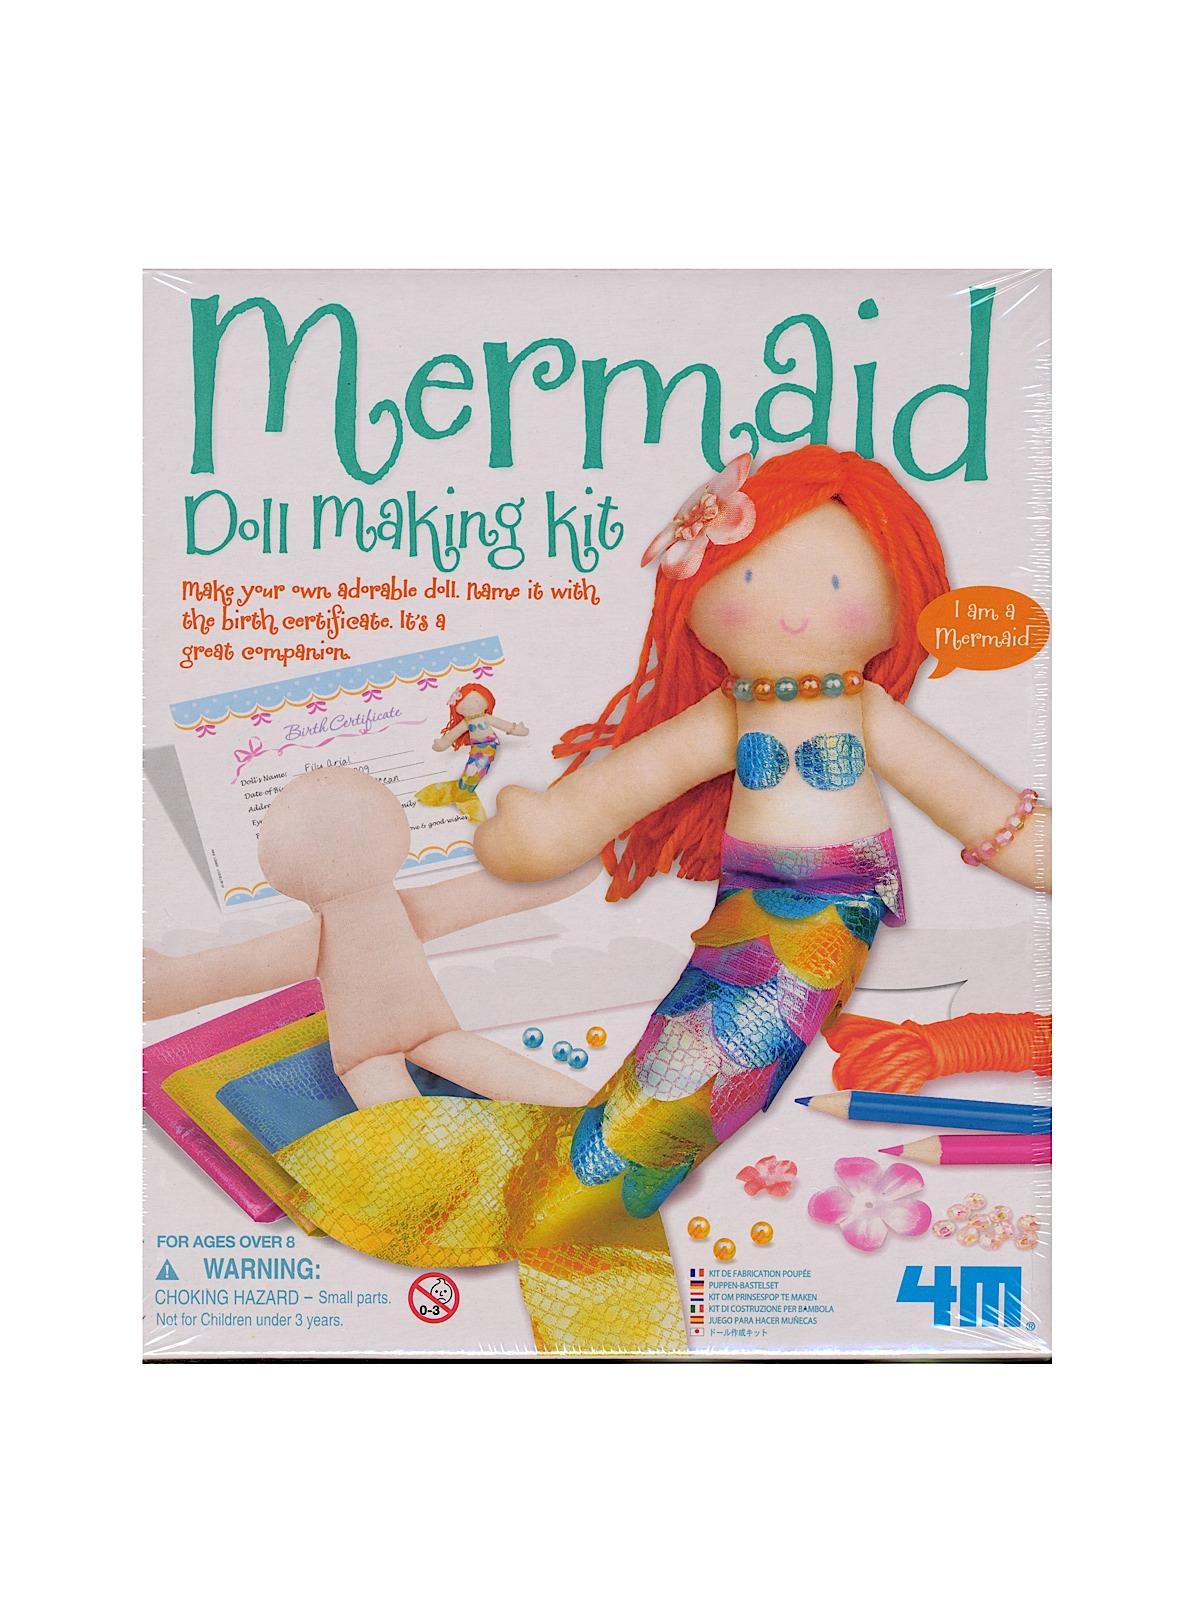 Mermaid Doll Making Kit